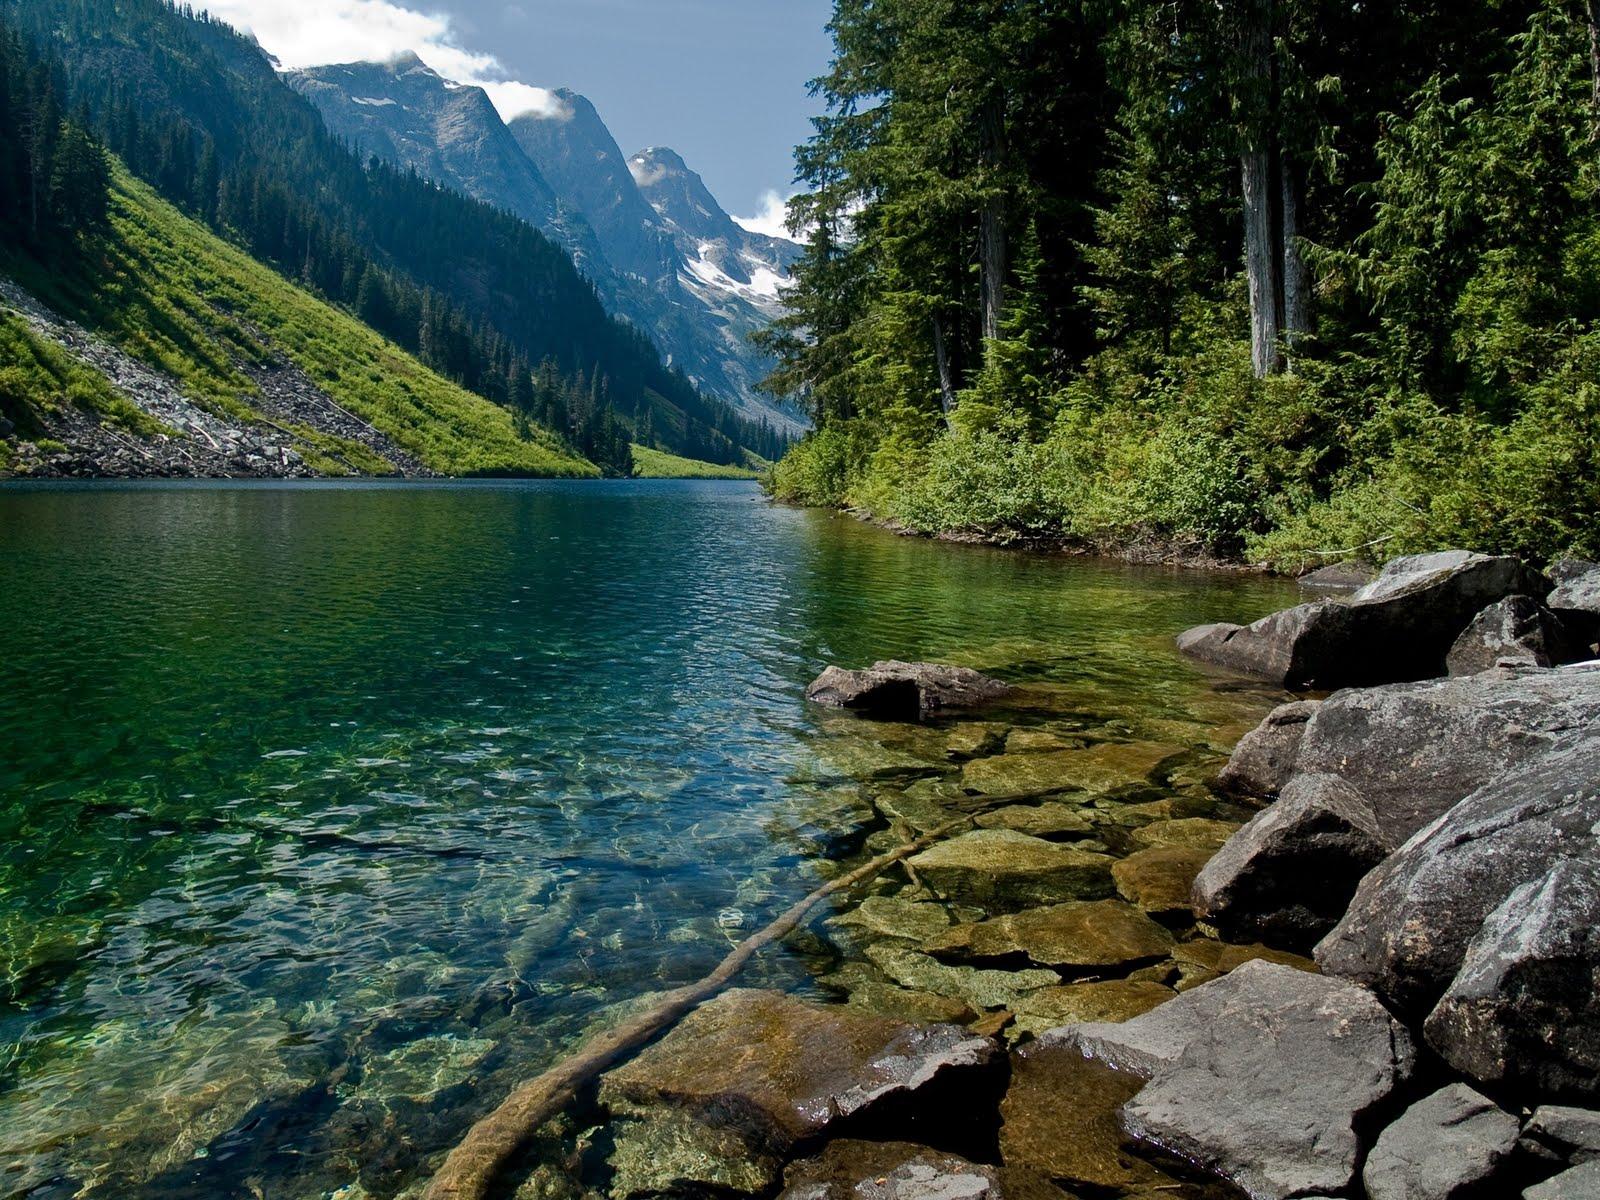 Fotos de paisajes   Facebook Gratis 1600x1200